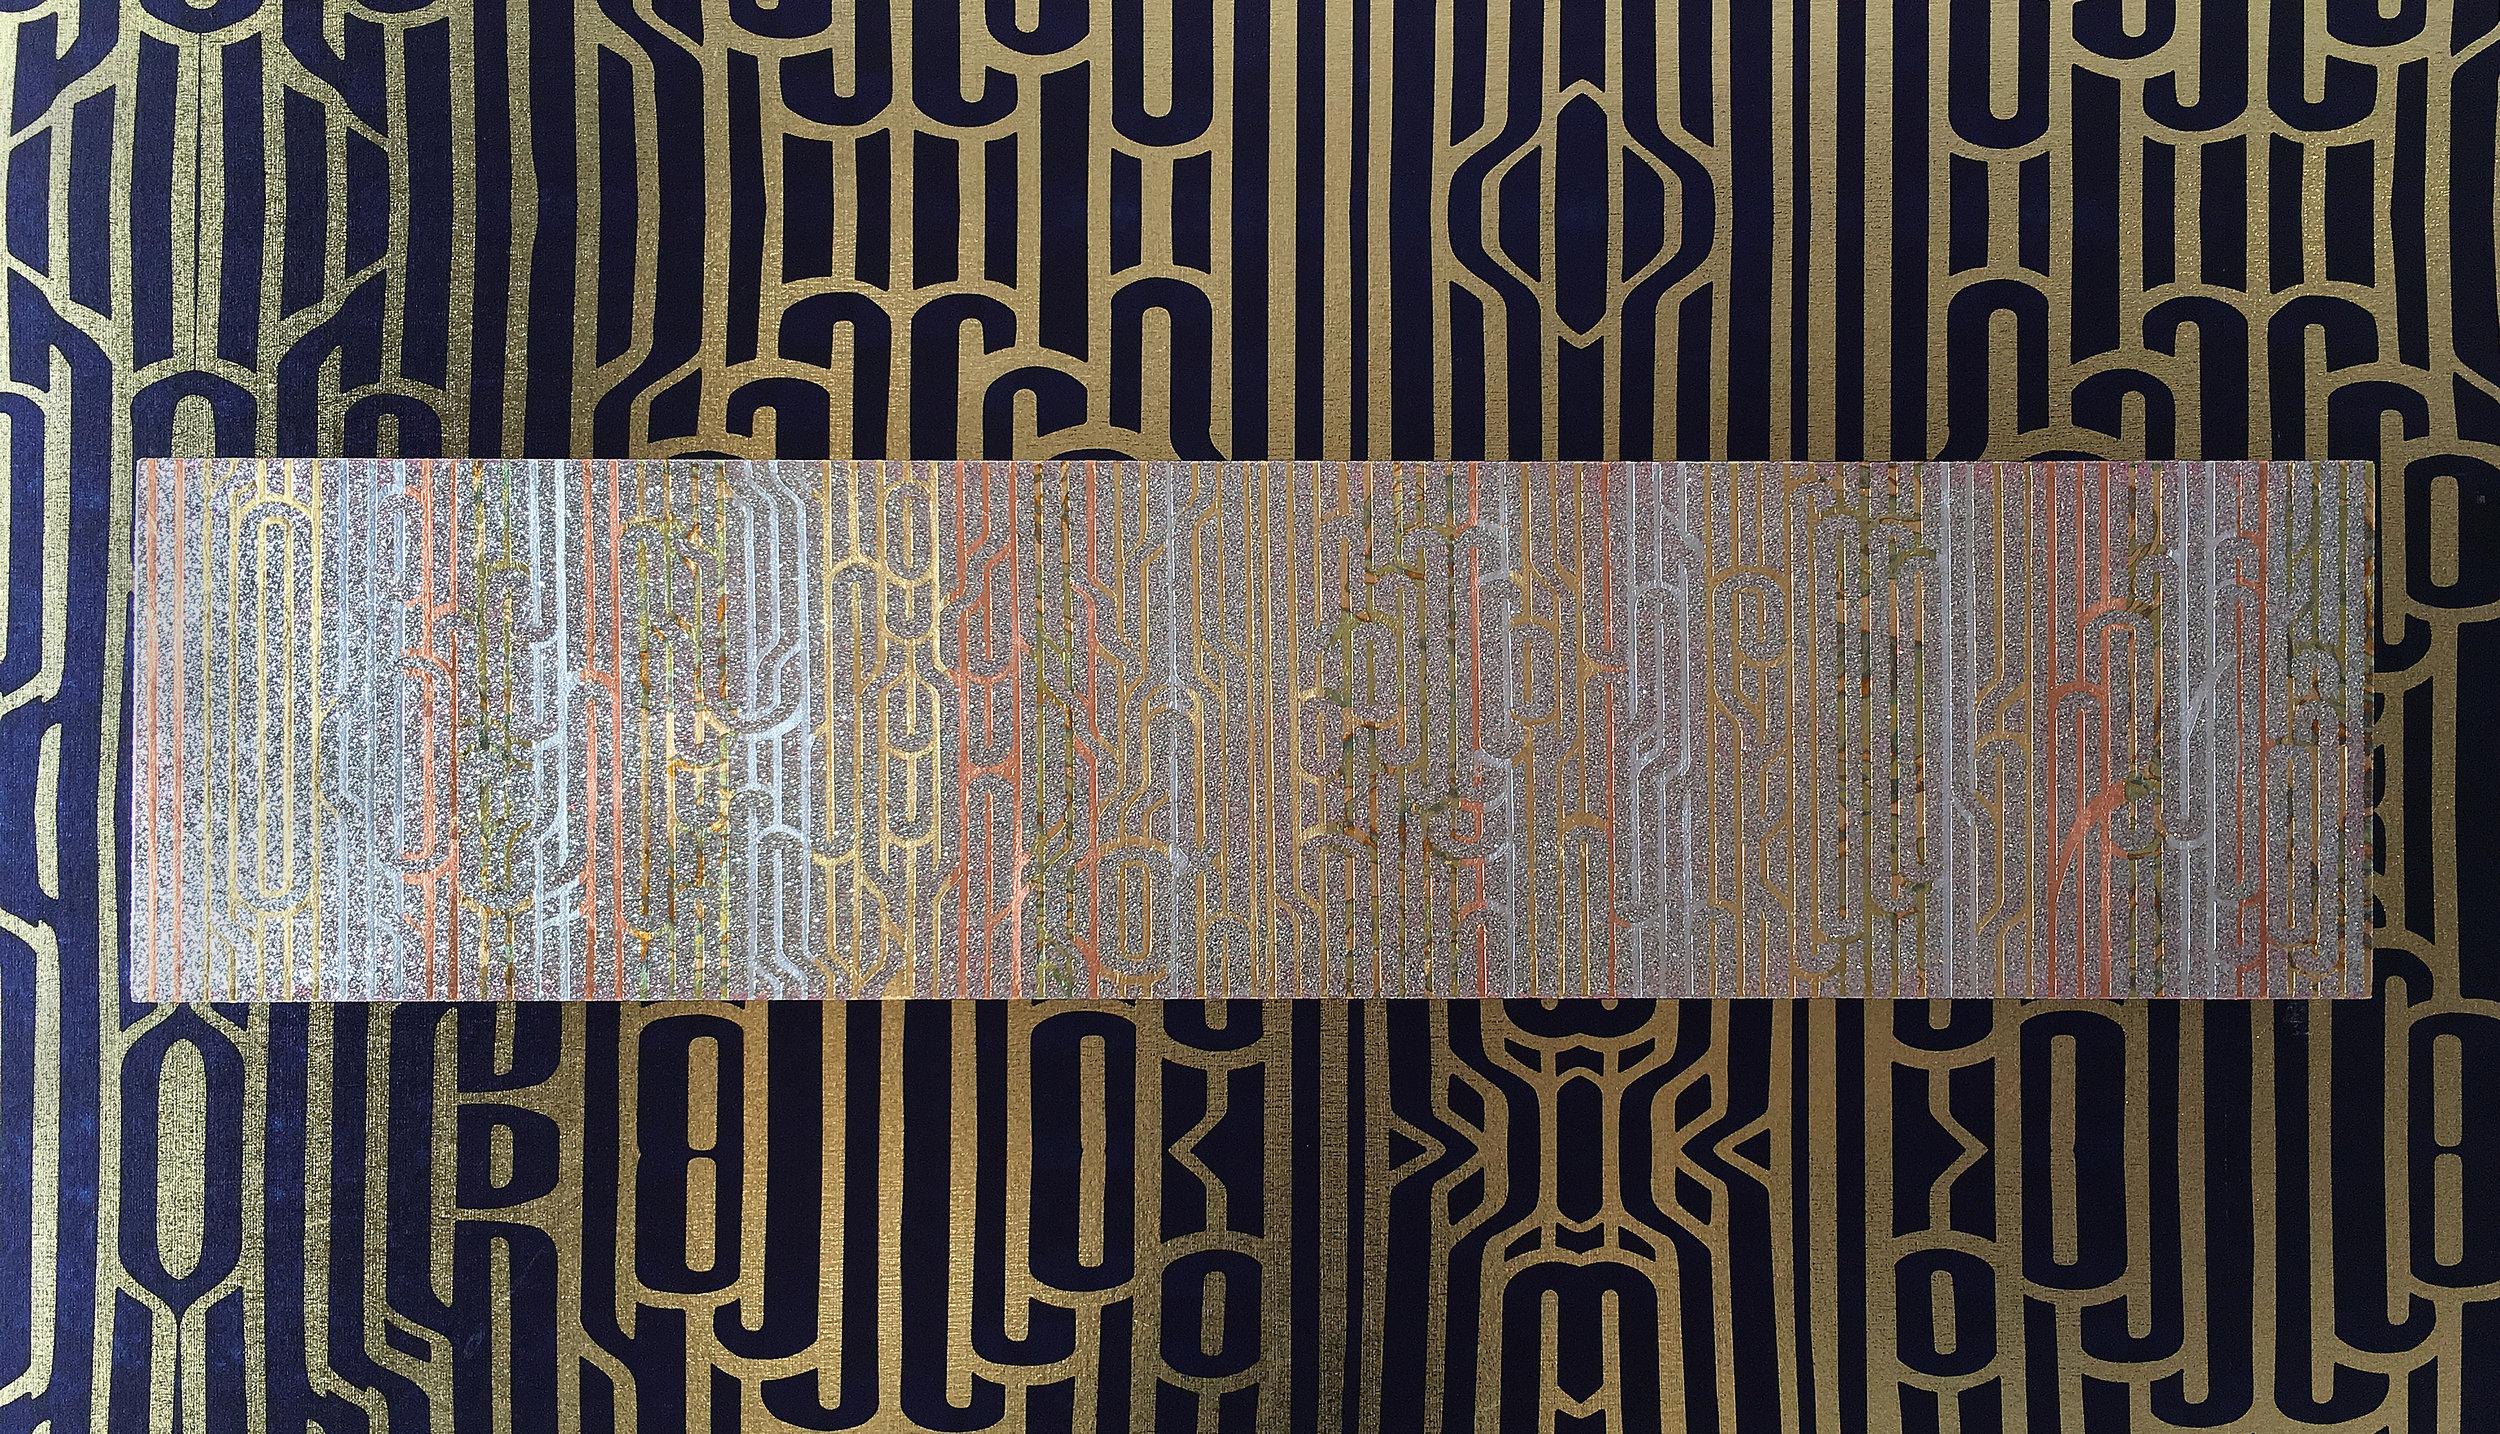 "Flëkz  Ritmo (Rhythm) with Londubh Studio LA / 12"" x 48"" x 2"" / Tape, wood, gold, silver, bronze leaf, glitter.  Wallcovering: Ritmo available in 100 sq ft minimums."